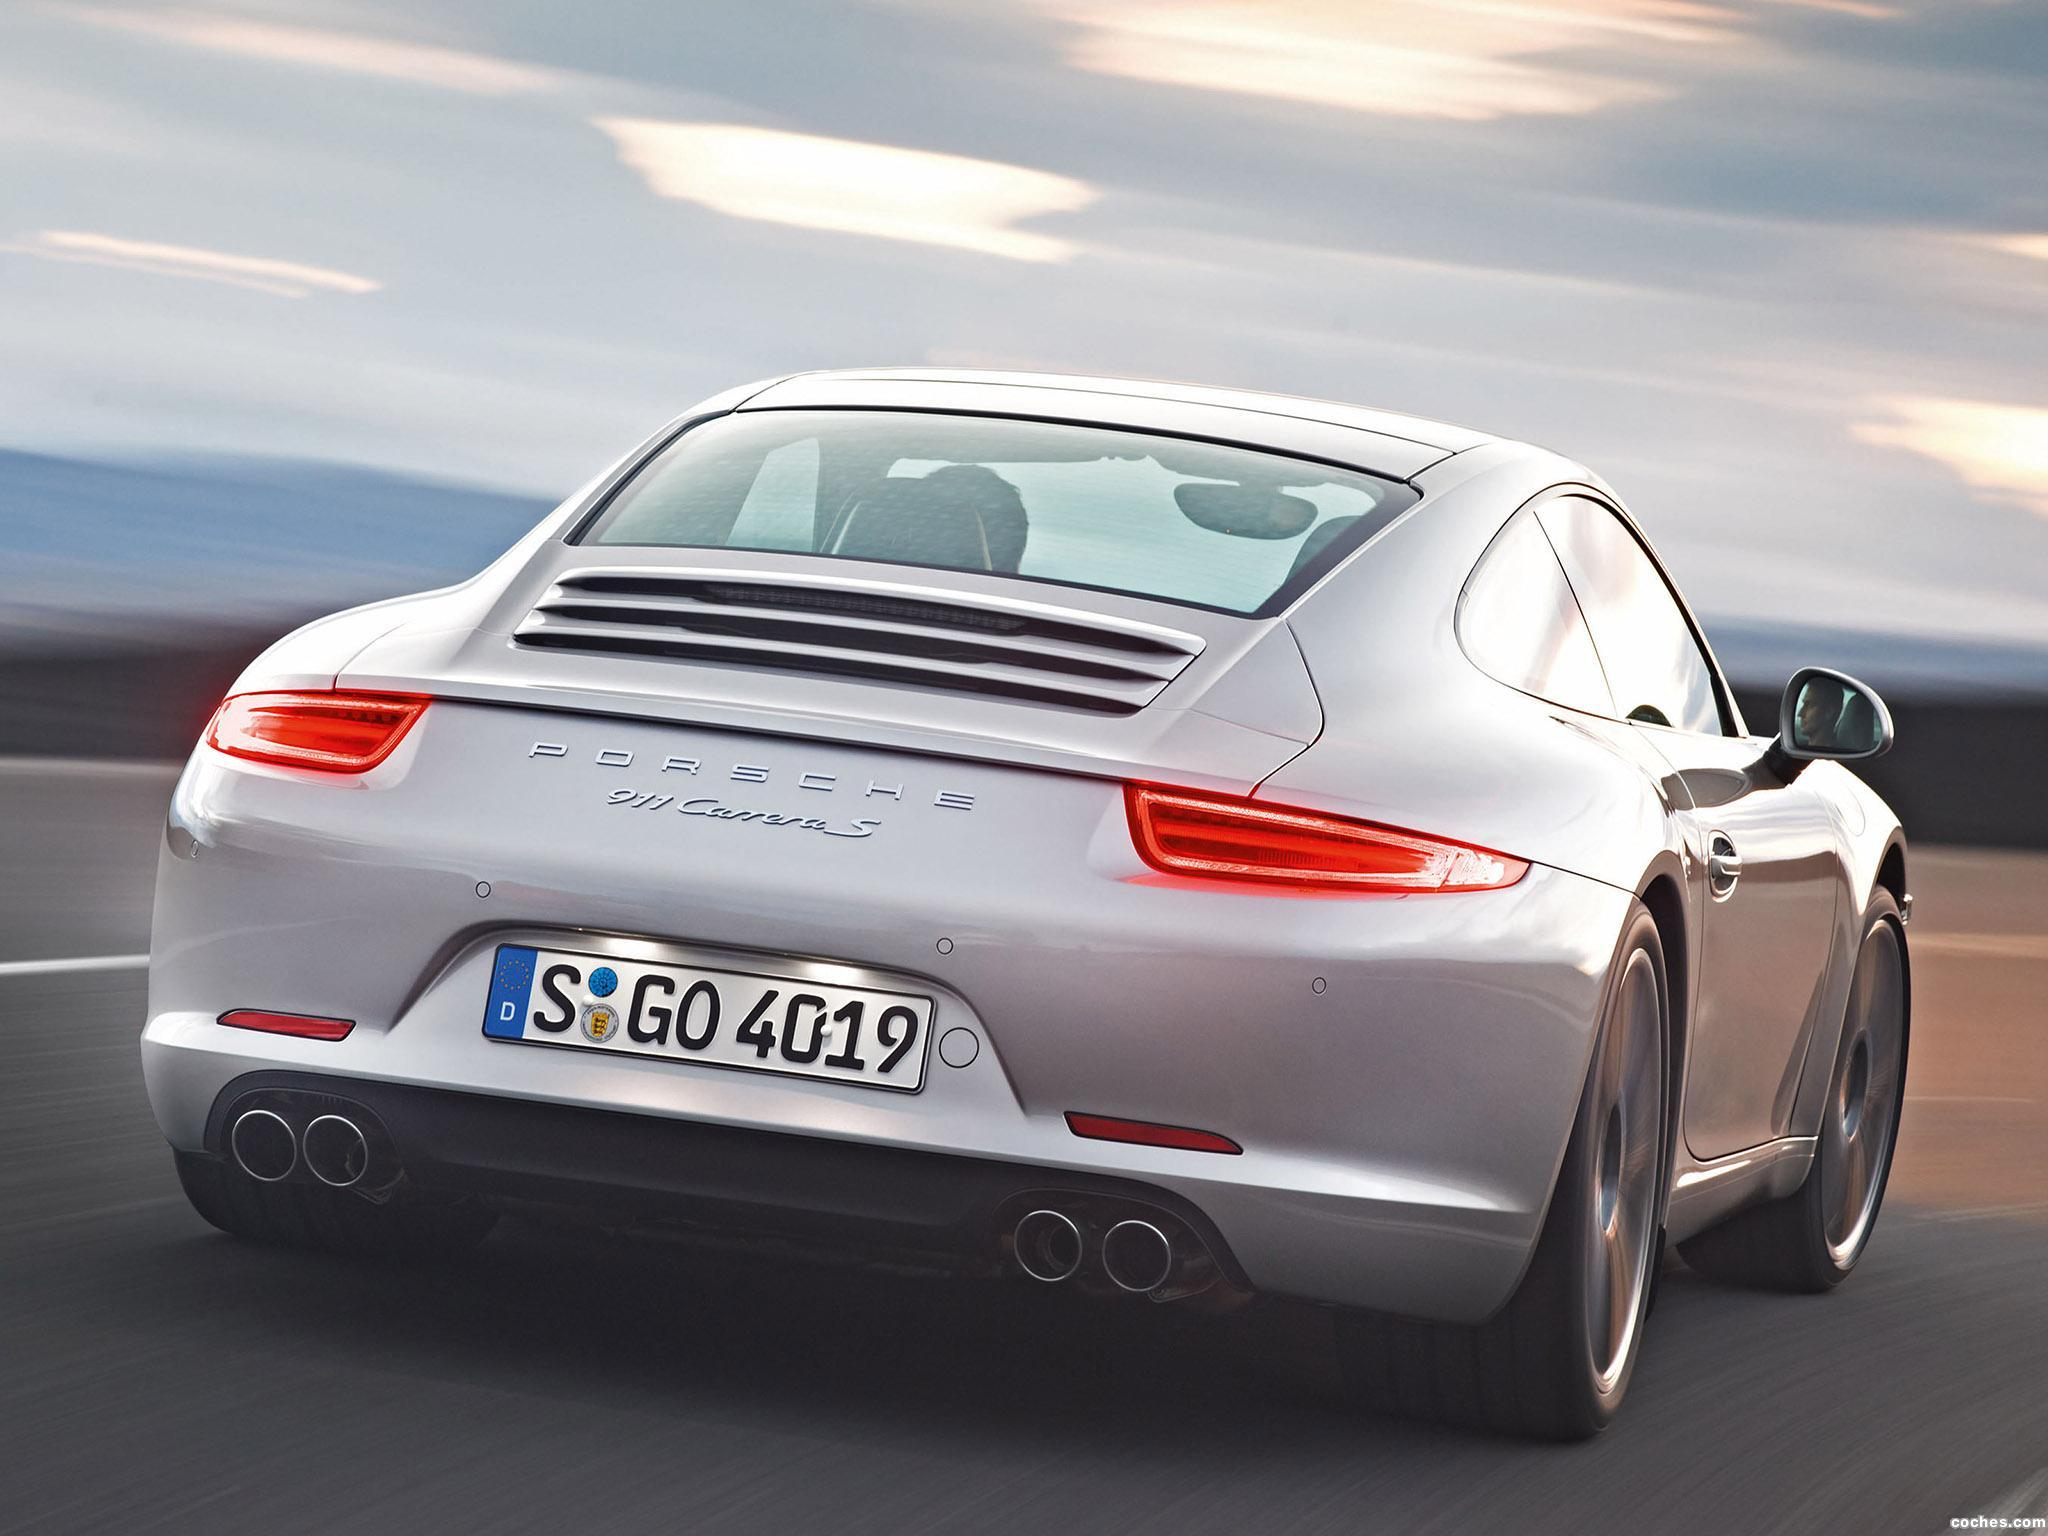 Foto 1 de Porsche 911 Carrera S Coupe 2011